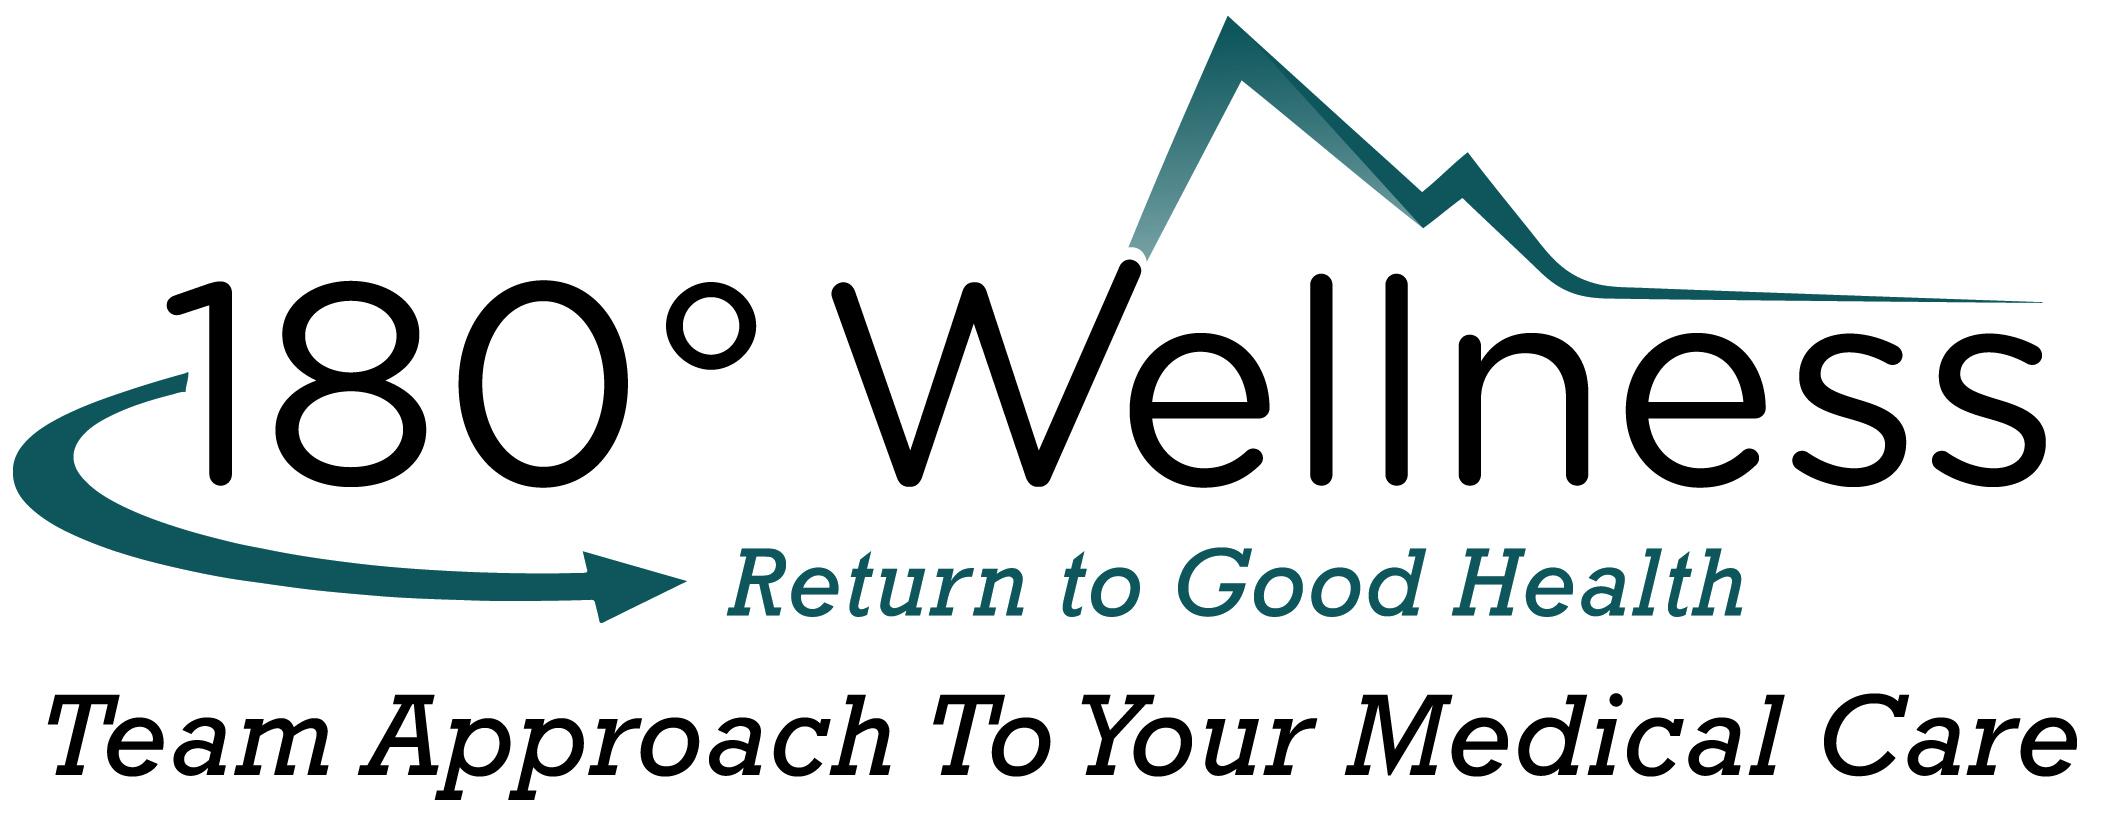 Midland Fitness-180° Wellness